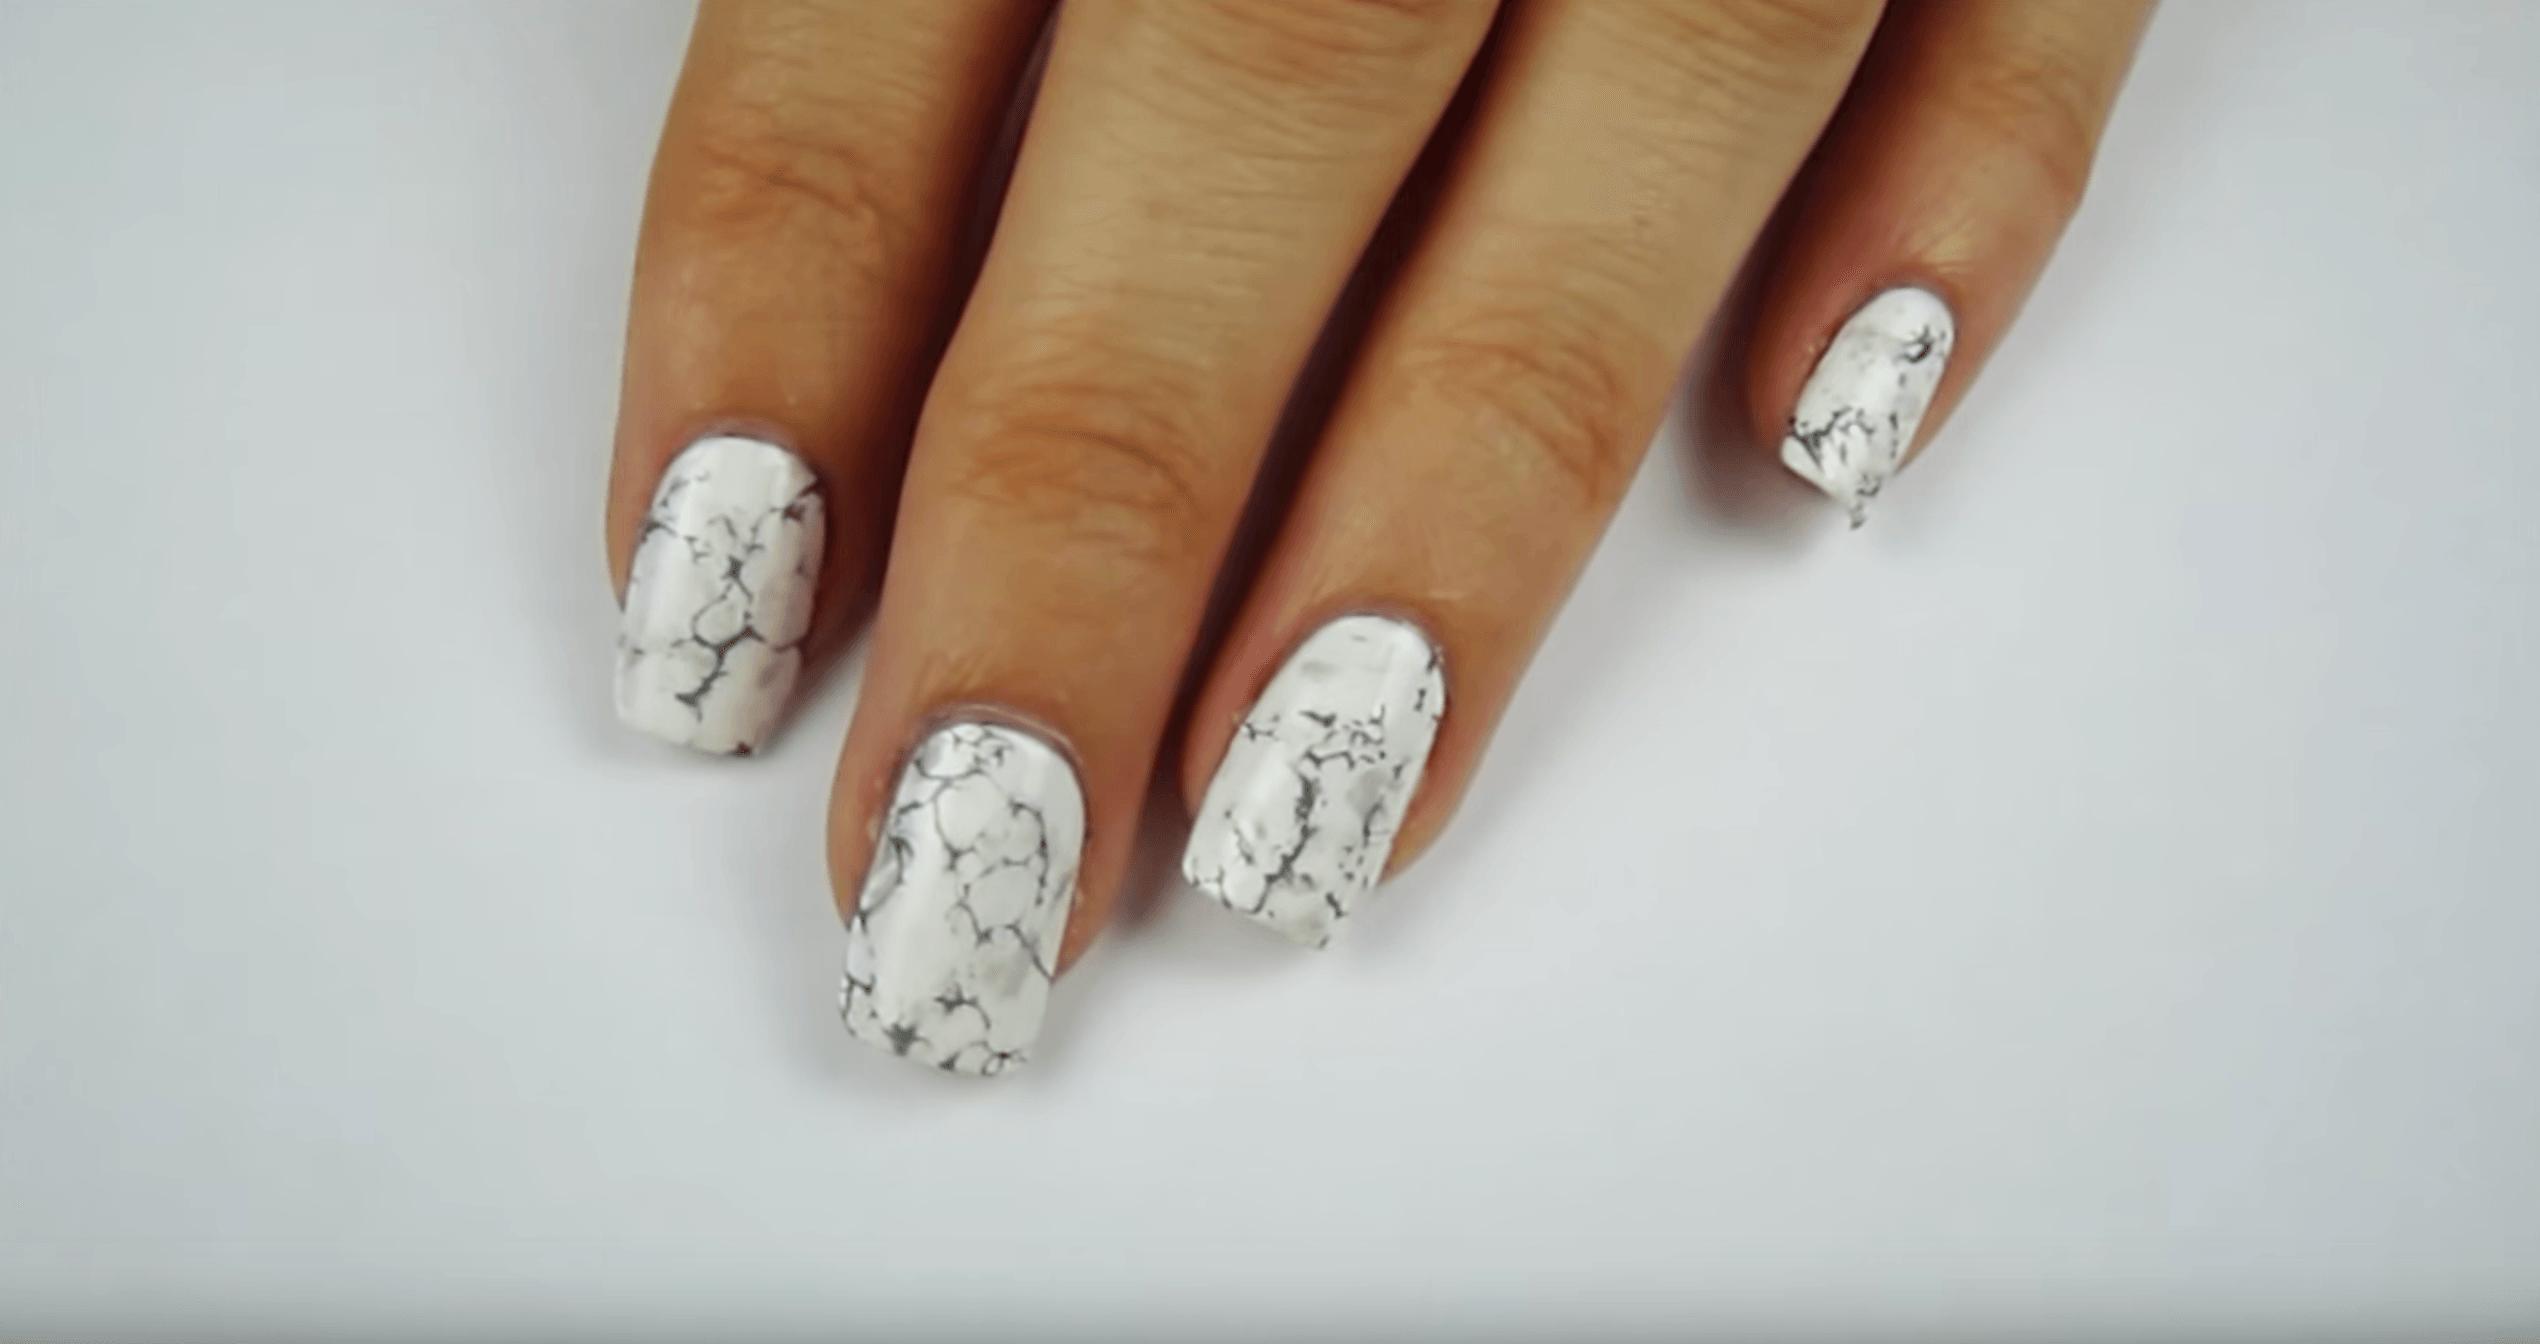 Video: DIY Water Marble Nails | Water marble nails, Marble nails ...